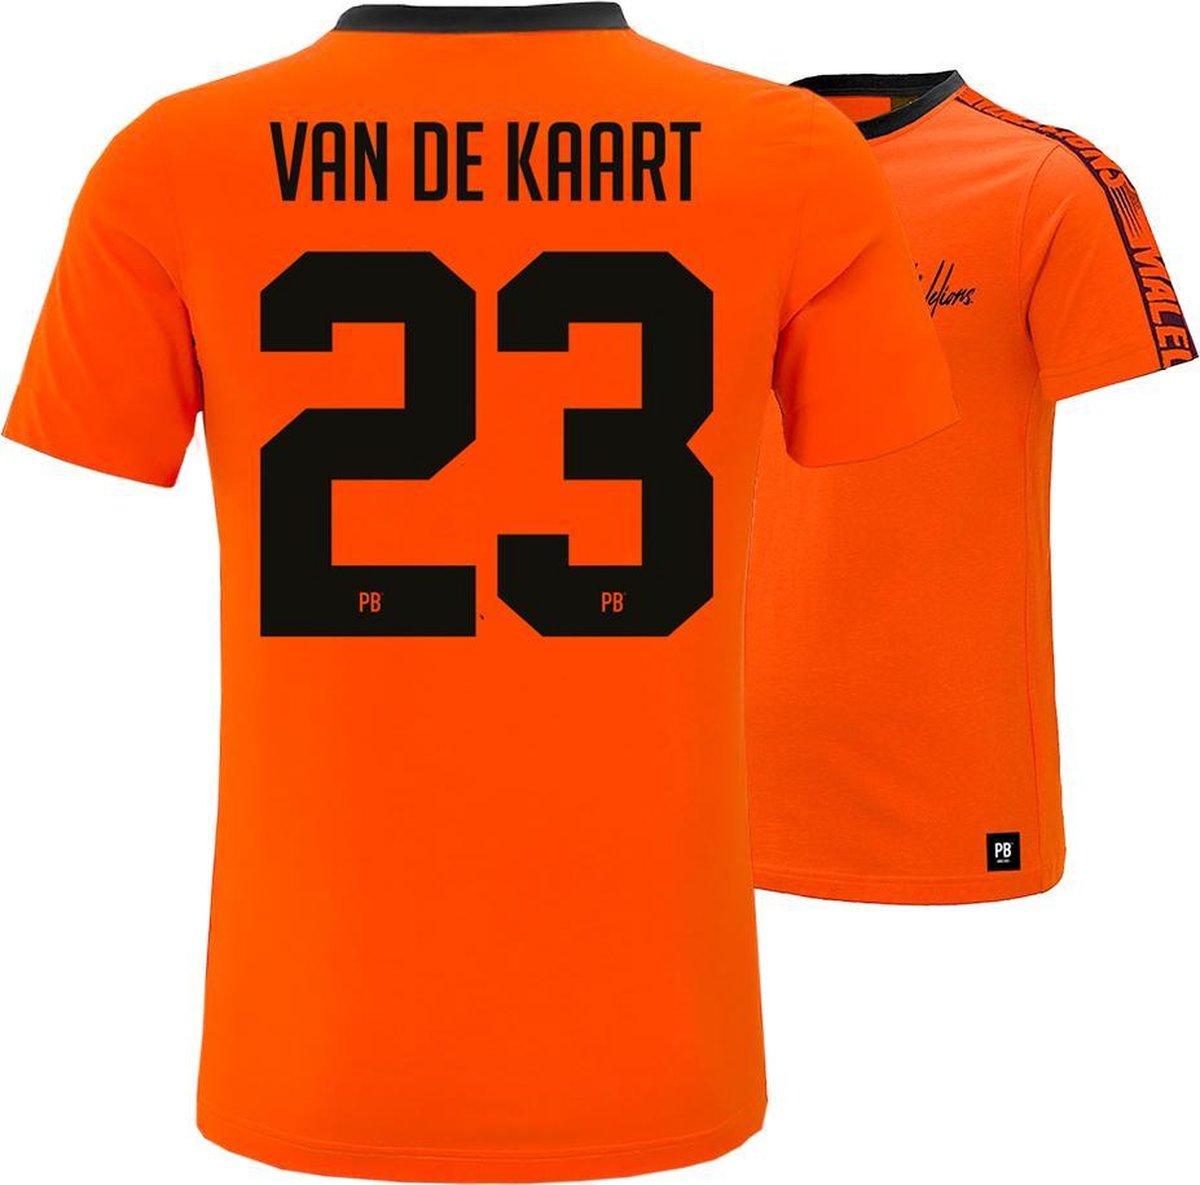 PB x Malelions - 23. Van de Kaart   Maat L   Oranje T-shirt   EK voetbal 2021   Heren en dames